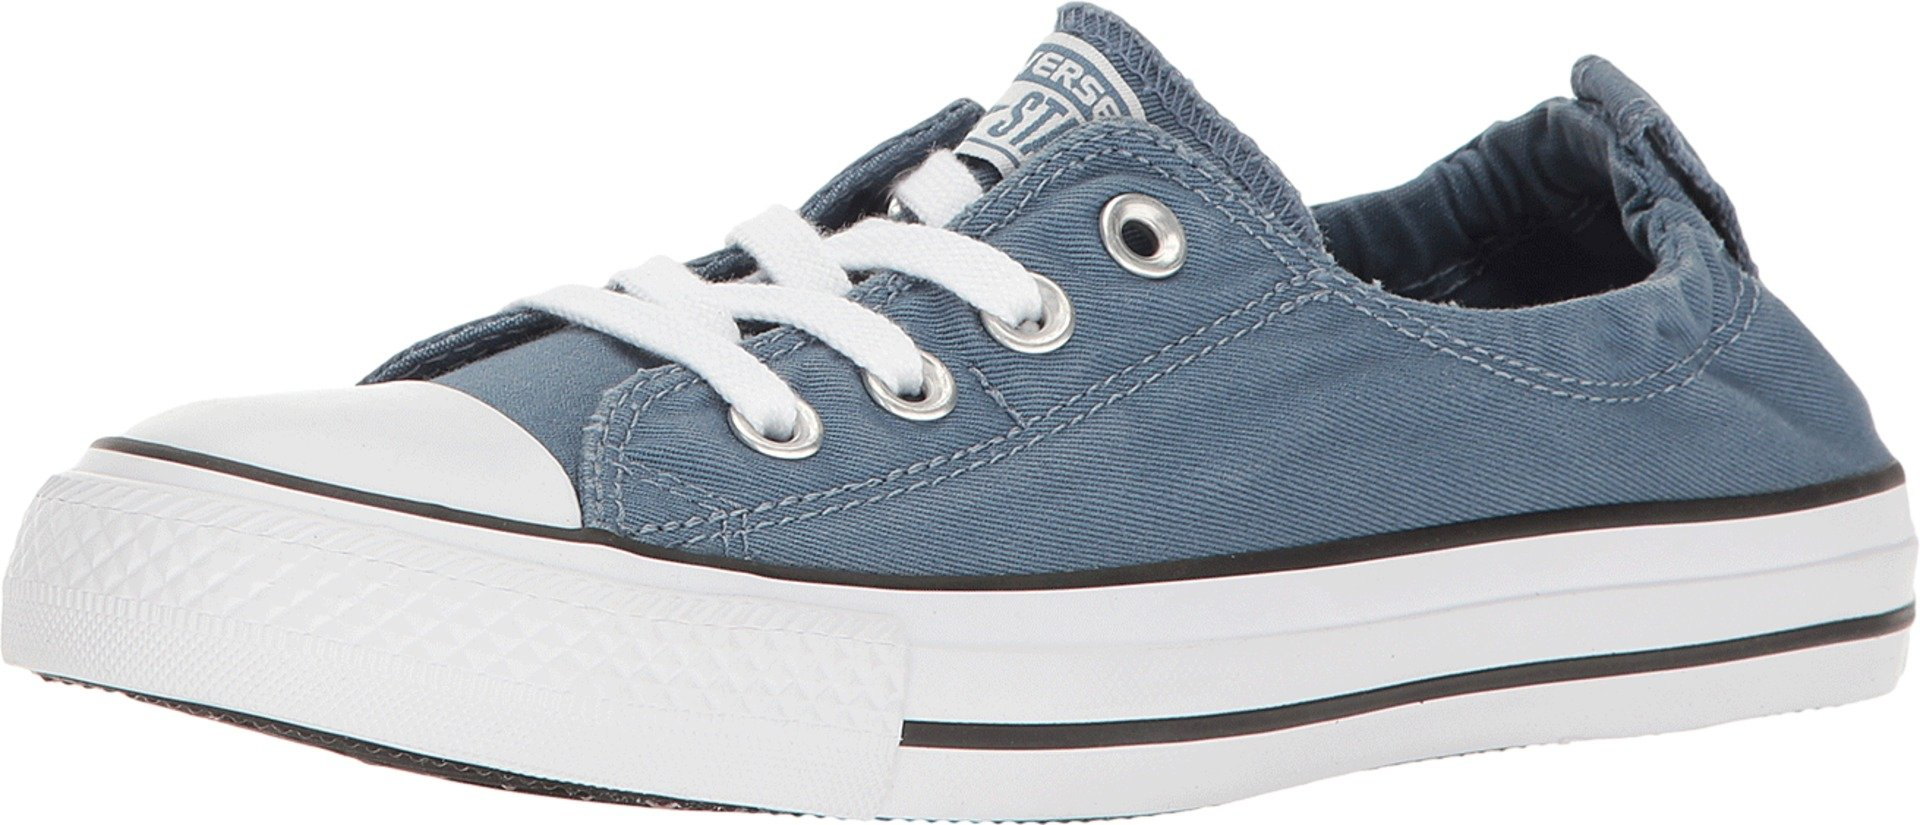 2c7ffeca4bea6 Converse Chuck Taylor All Star Shoreline Blue Coast White Lace-Up Sneaker -  10 B(M) US